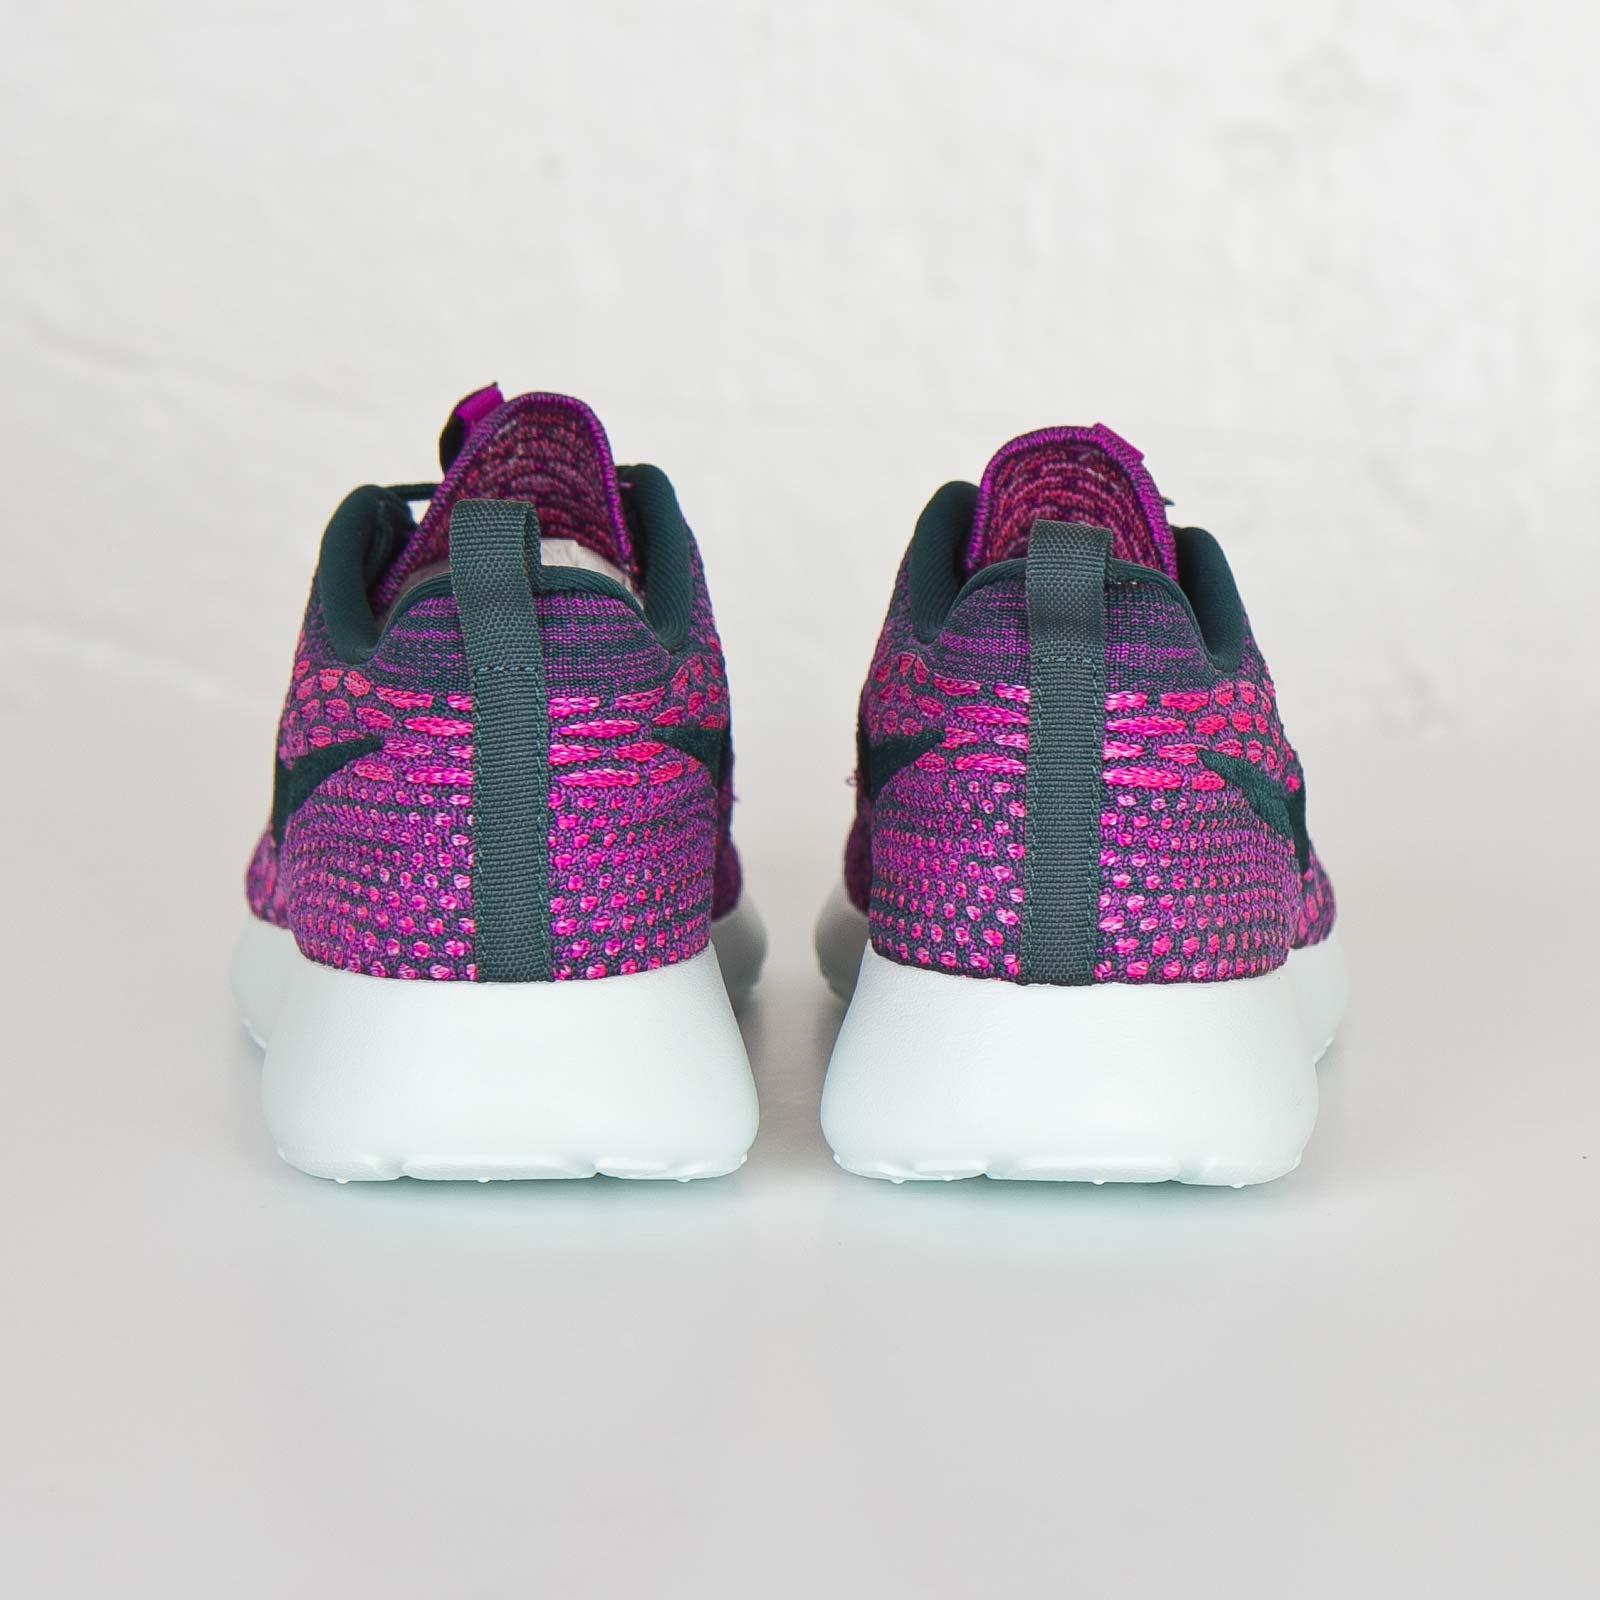 af8b1451c1907 Nike Wmns Roshe One Flyknit - 704927-302 - Sneakersnstuff